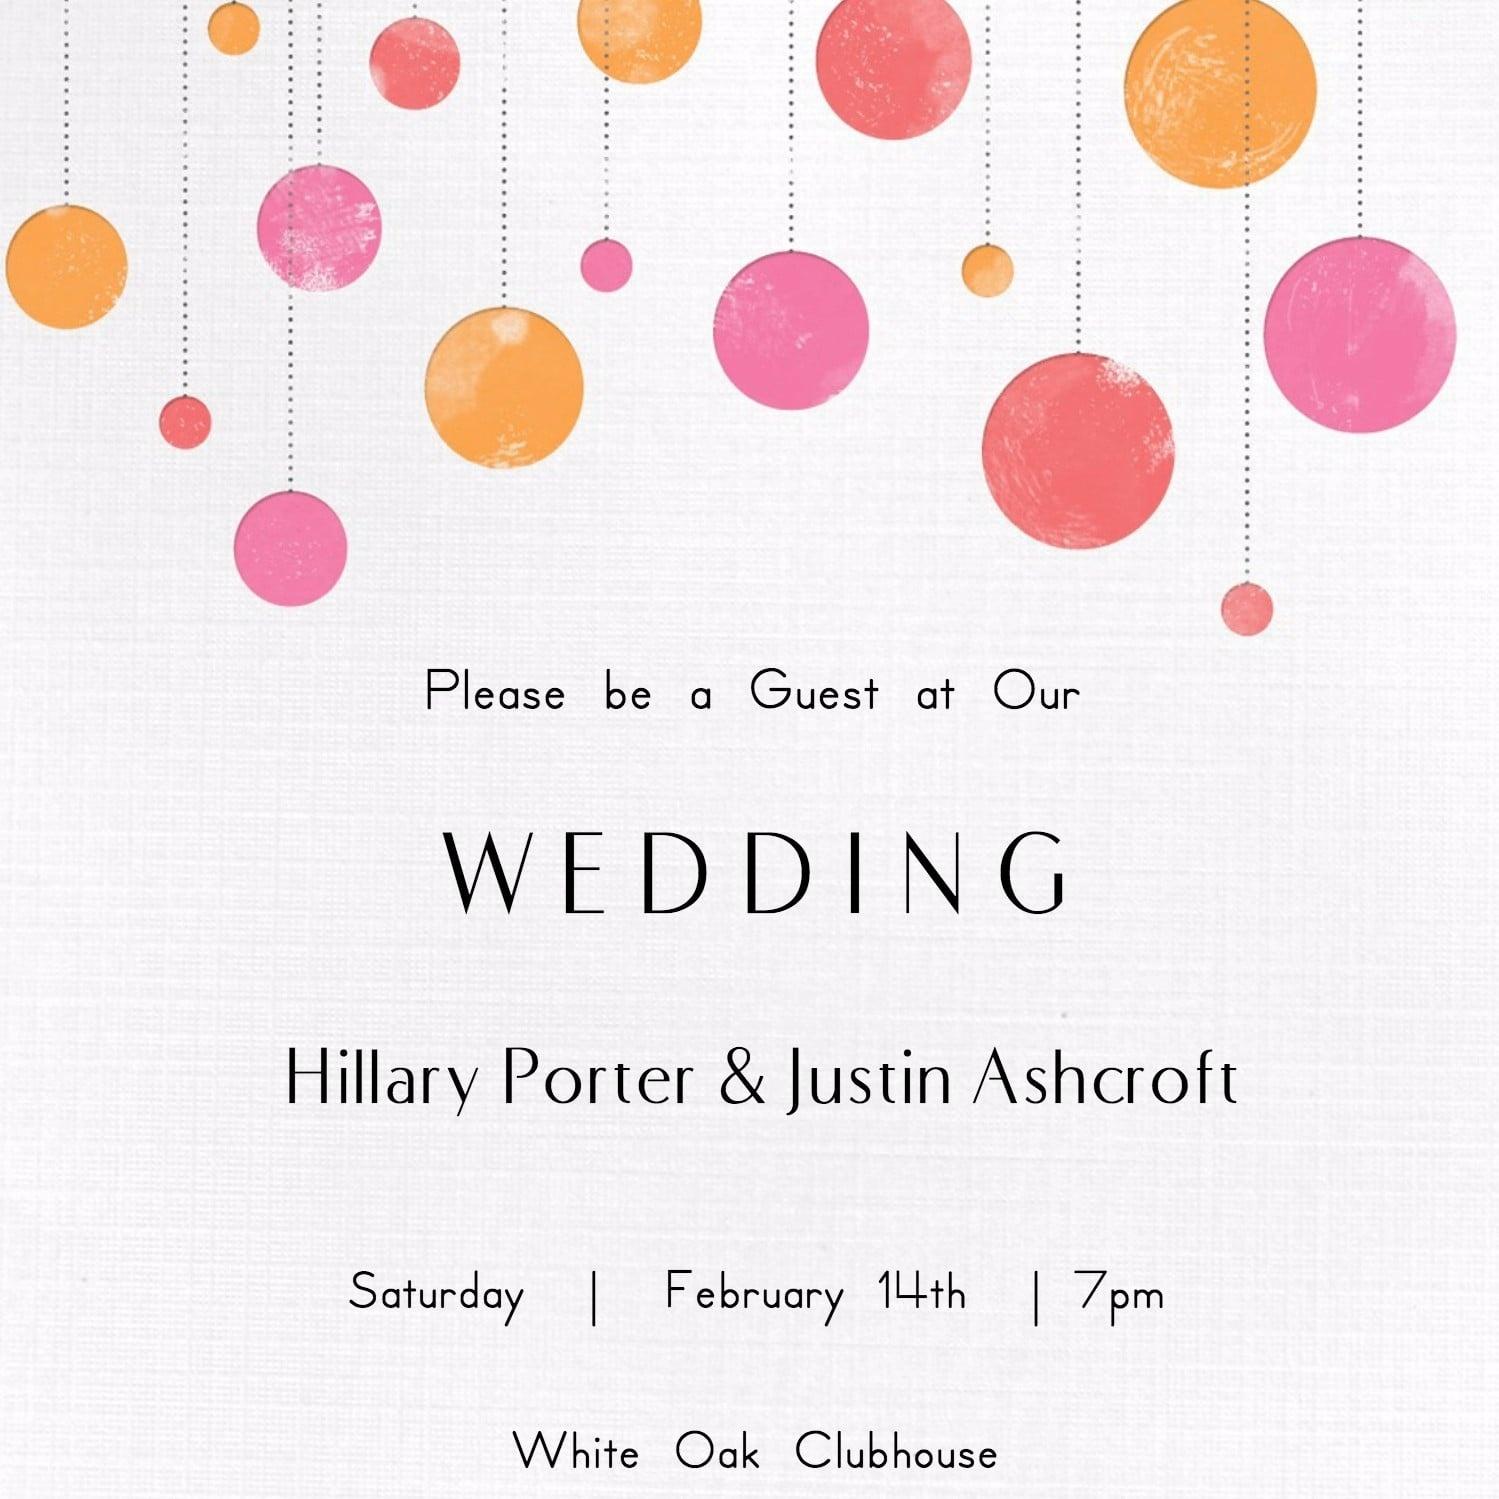 Free Printable Wedding Invitations | Popsugar Smart Living - Wedding Invitation Cards Printable Free